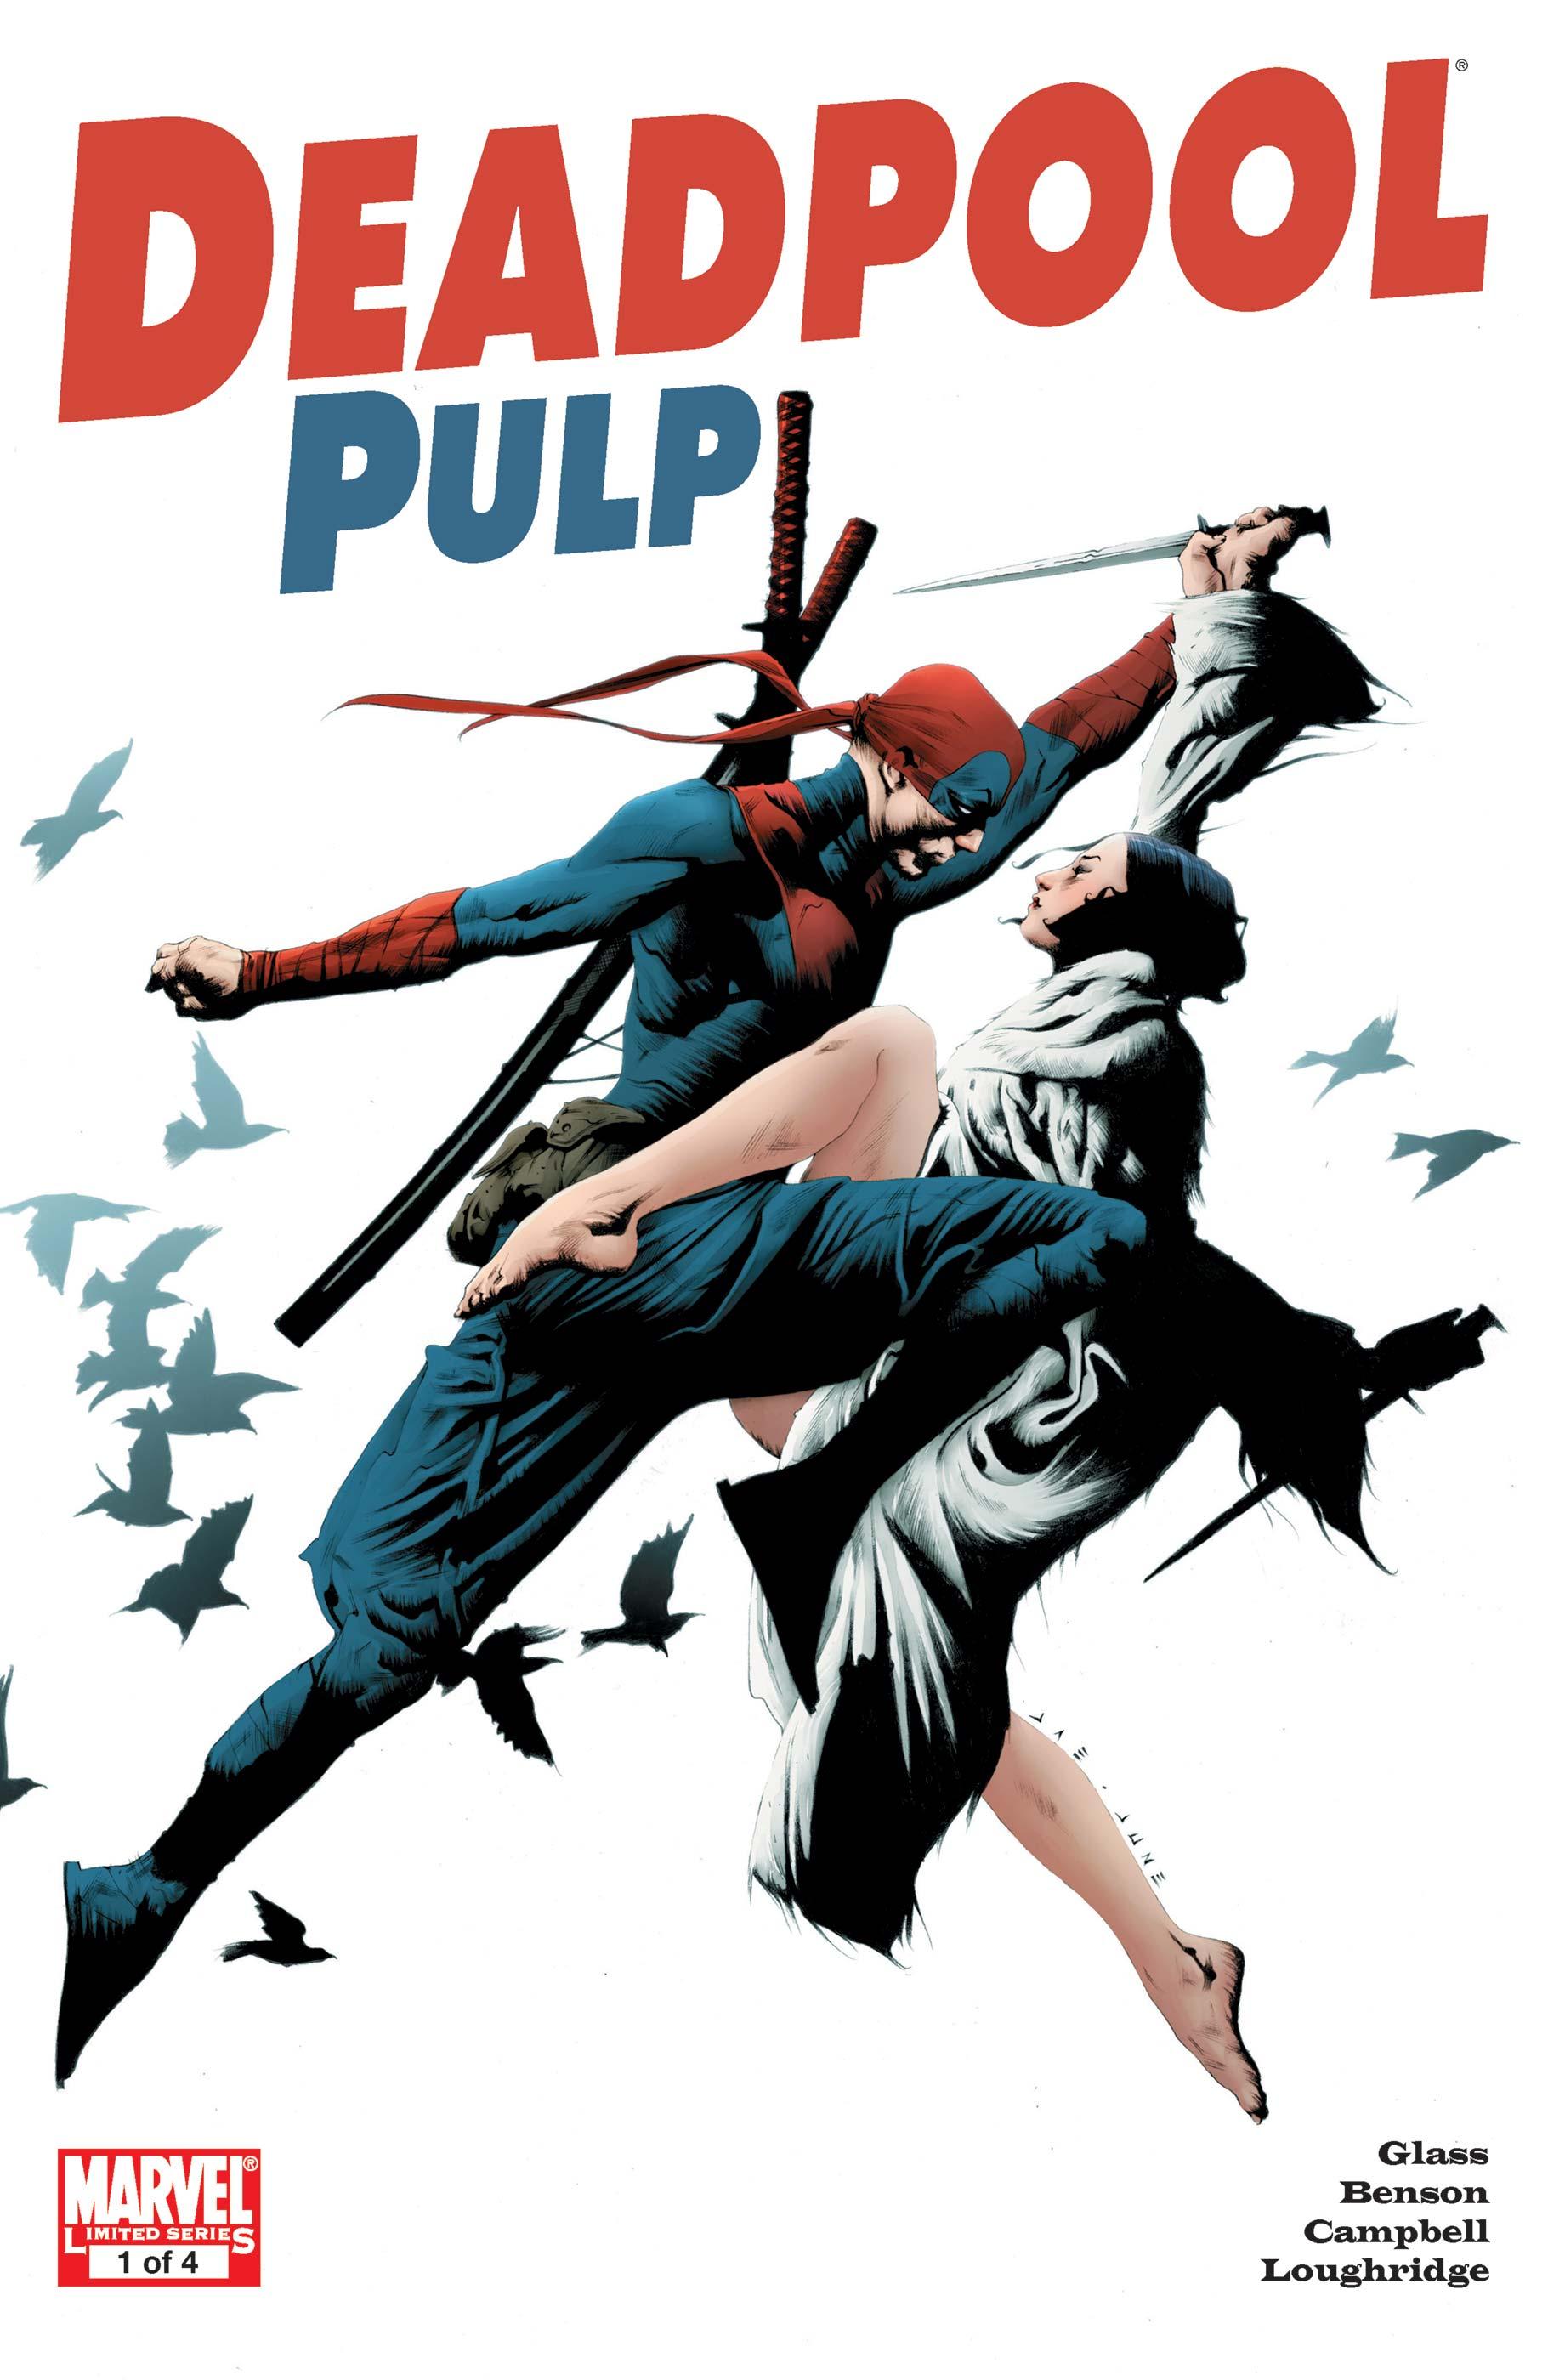 Deadpool Pulp (2010) #1